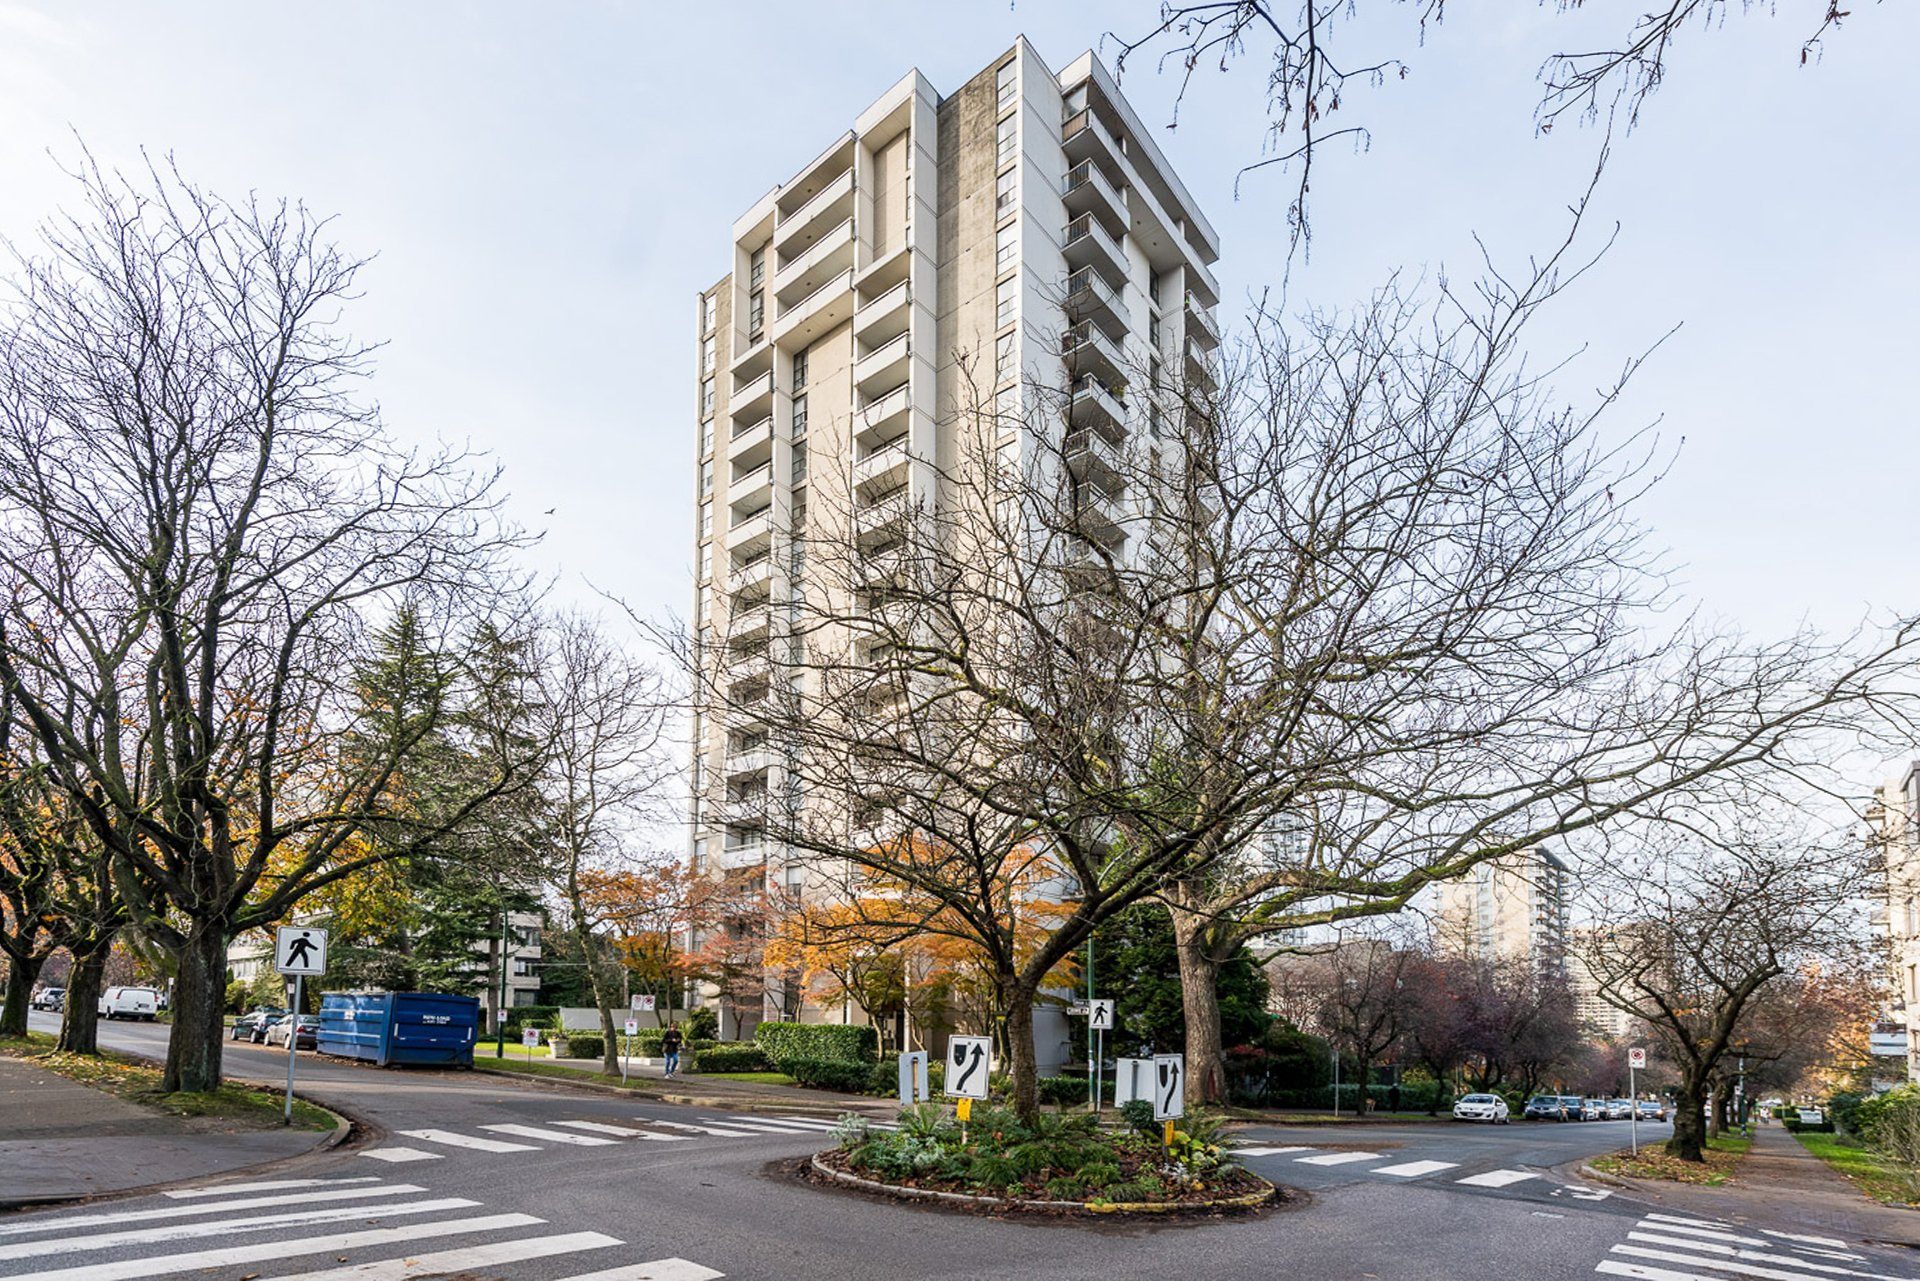 1005 Jervis St, Vancouver, BC - $2,910